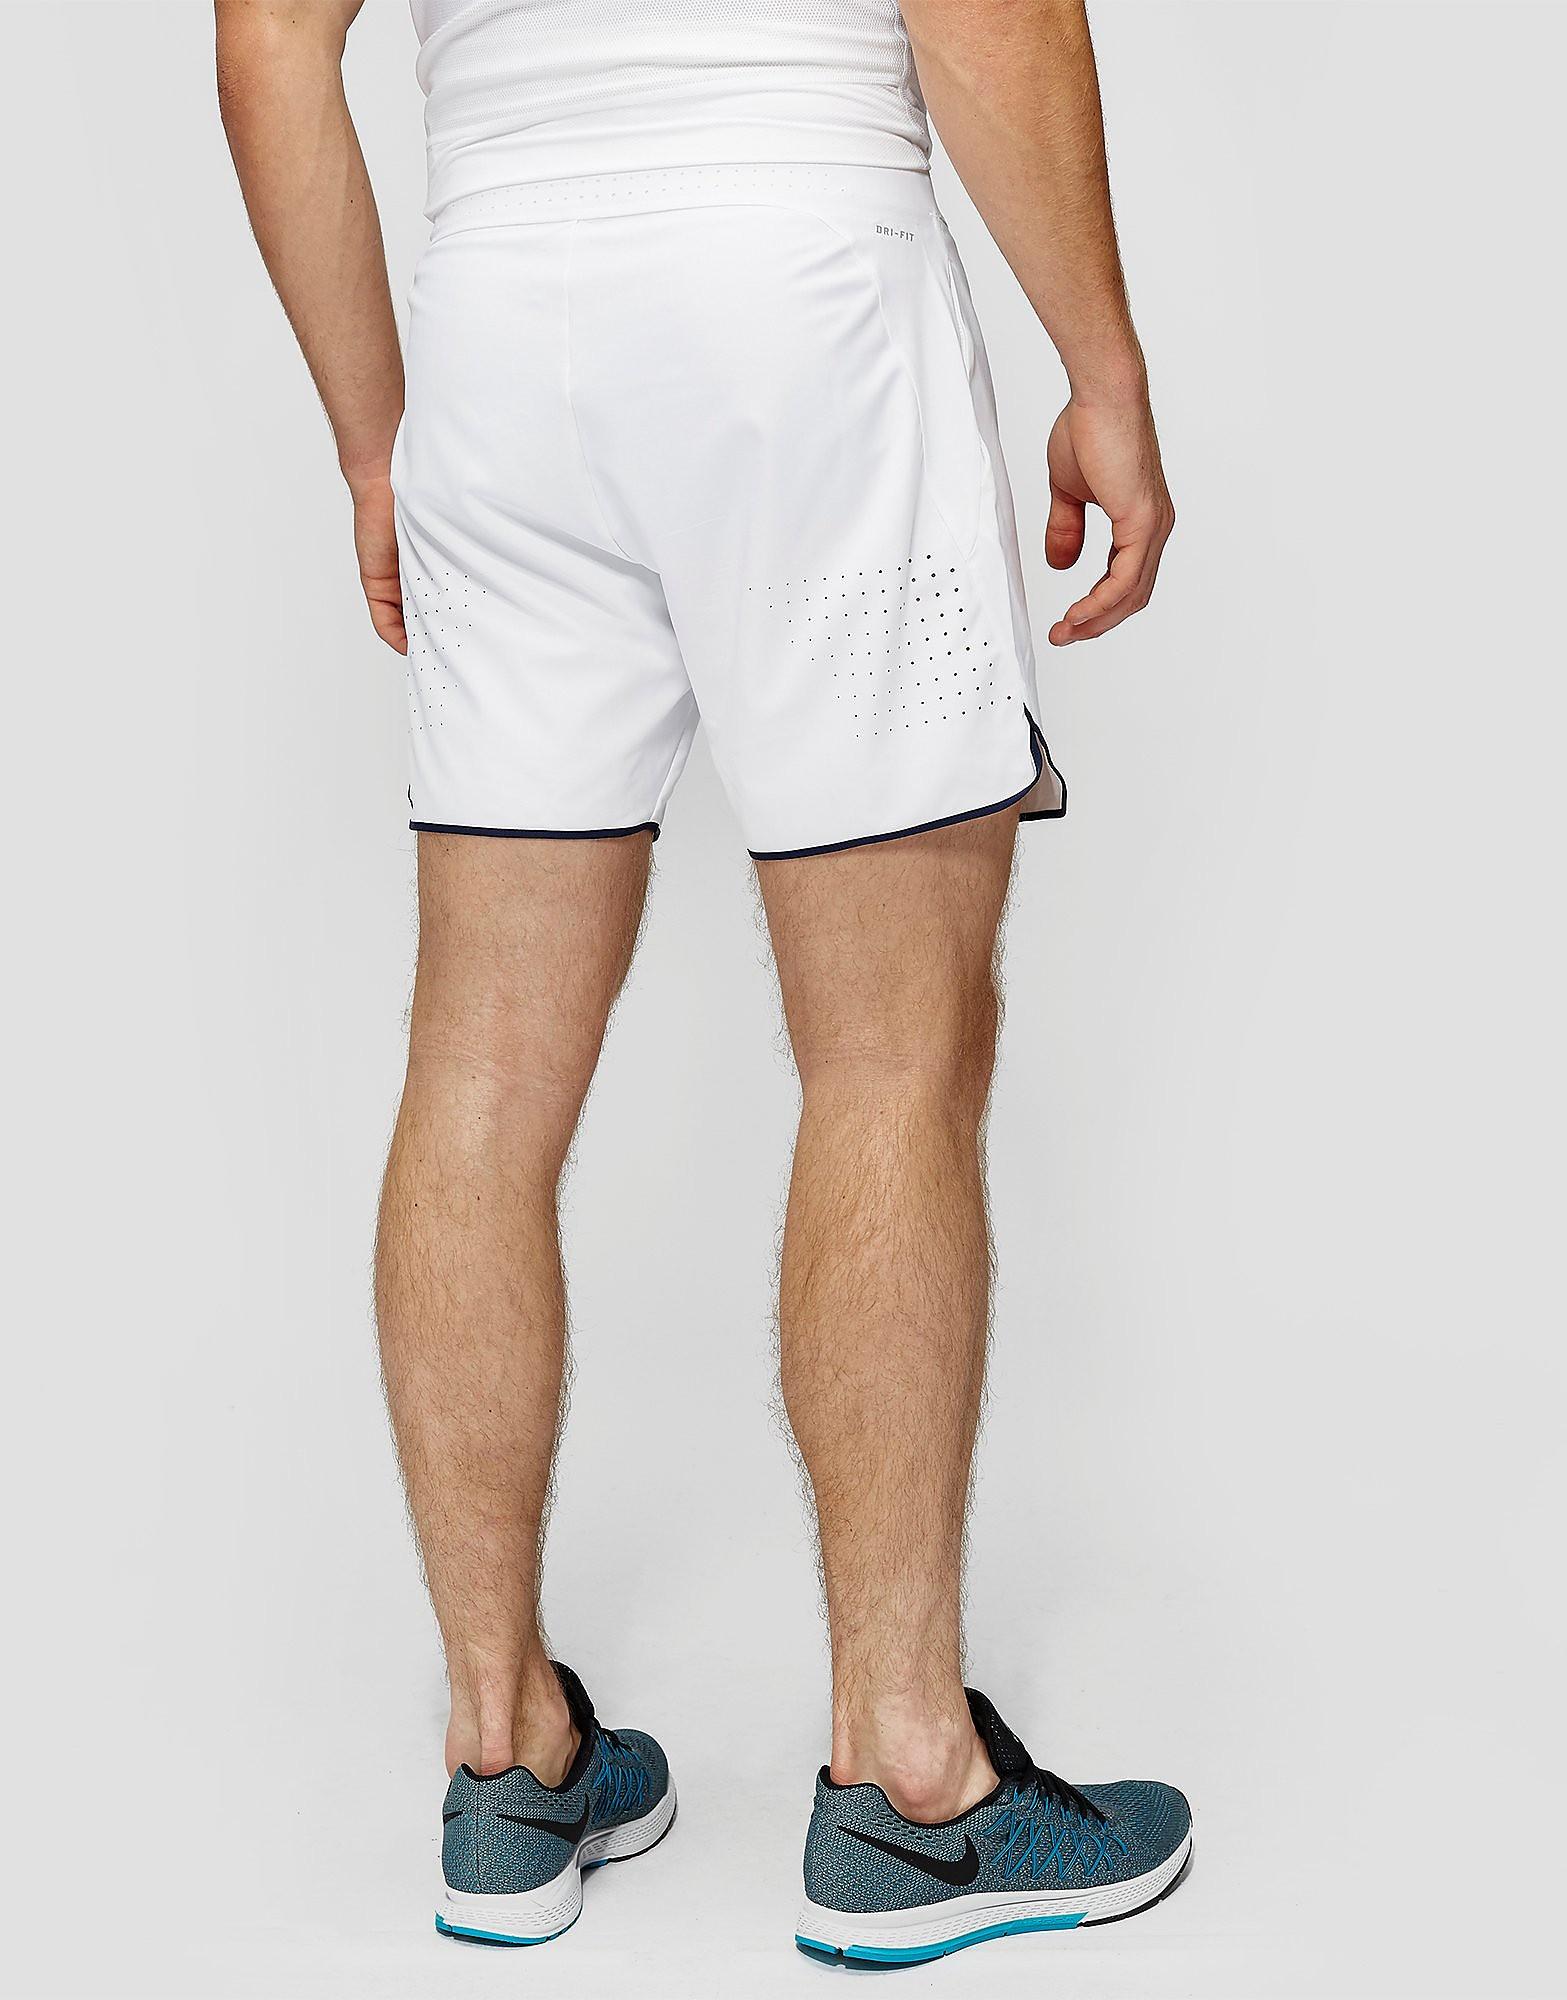 Nike Gladiator Premier 7 Tennis Shorts